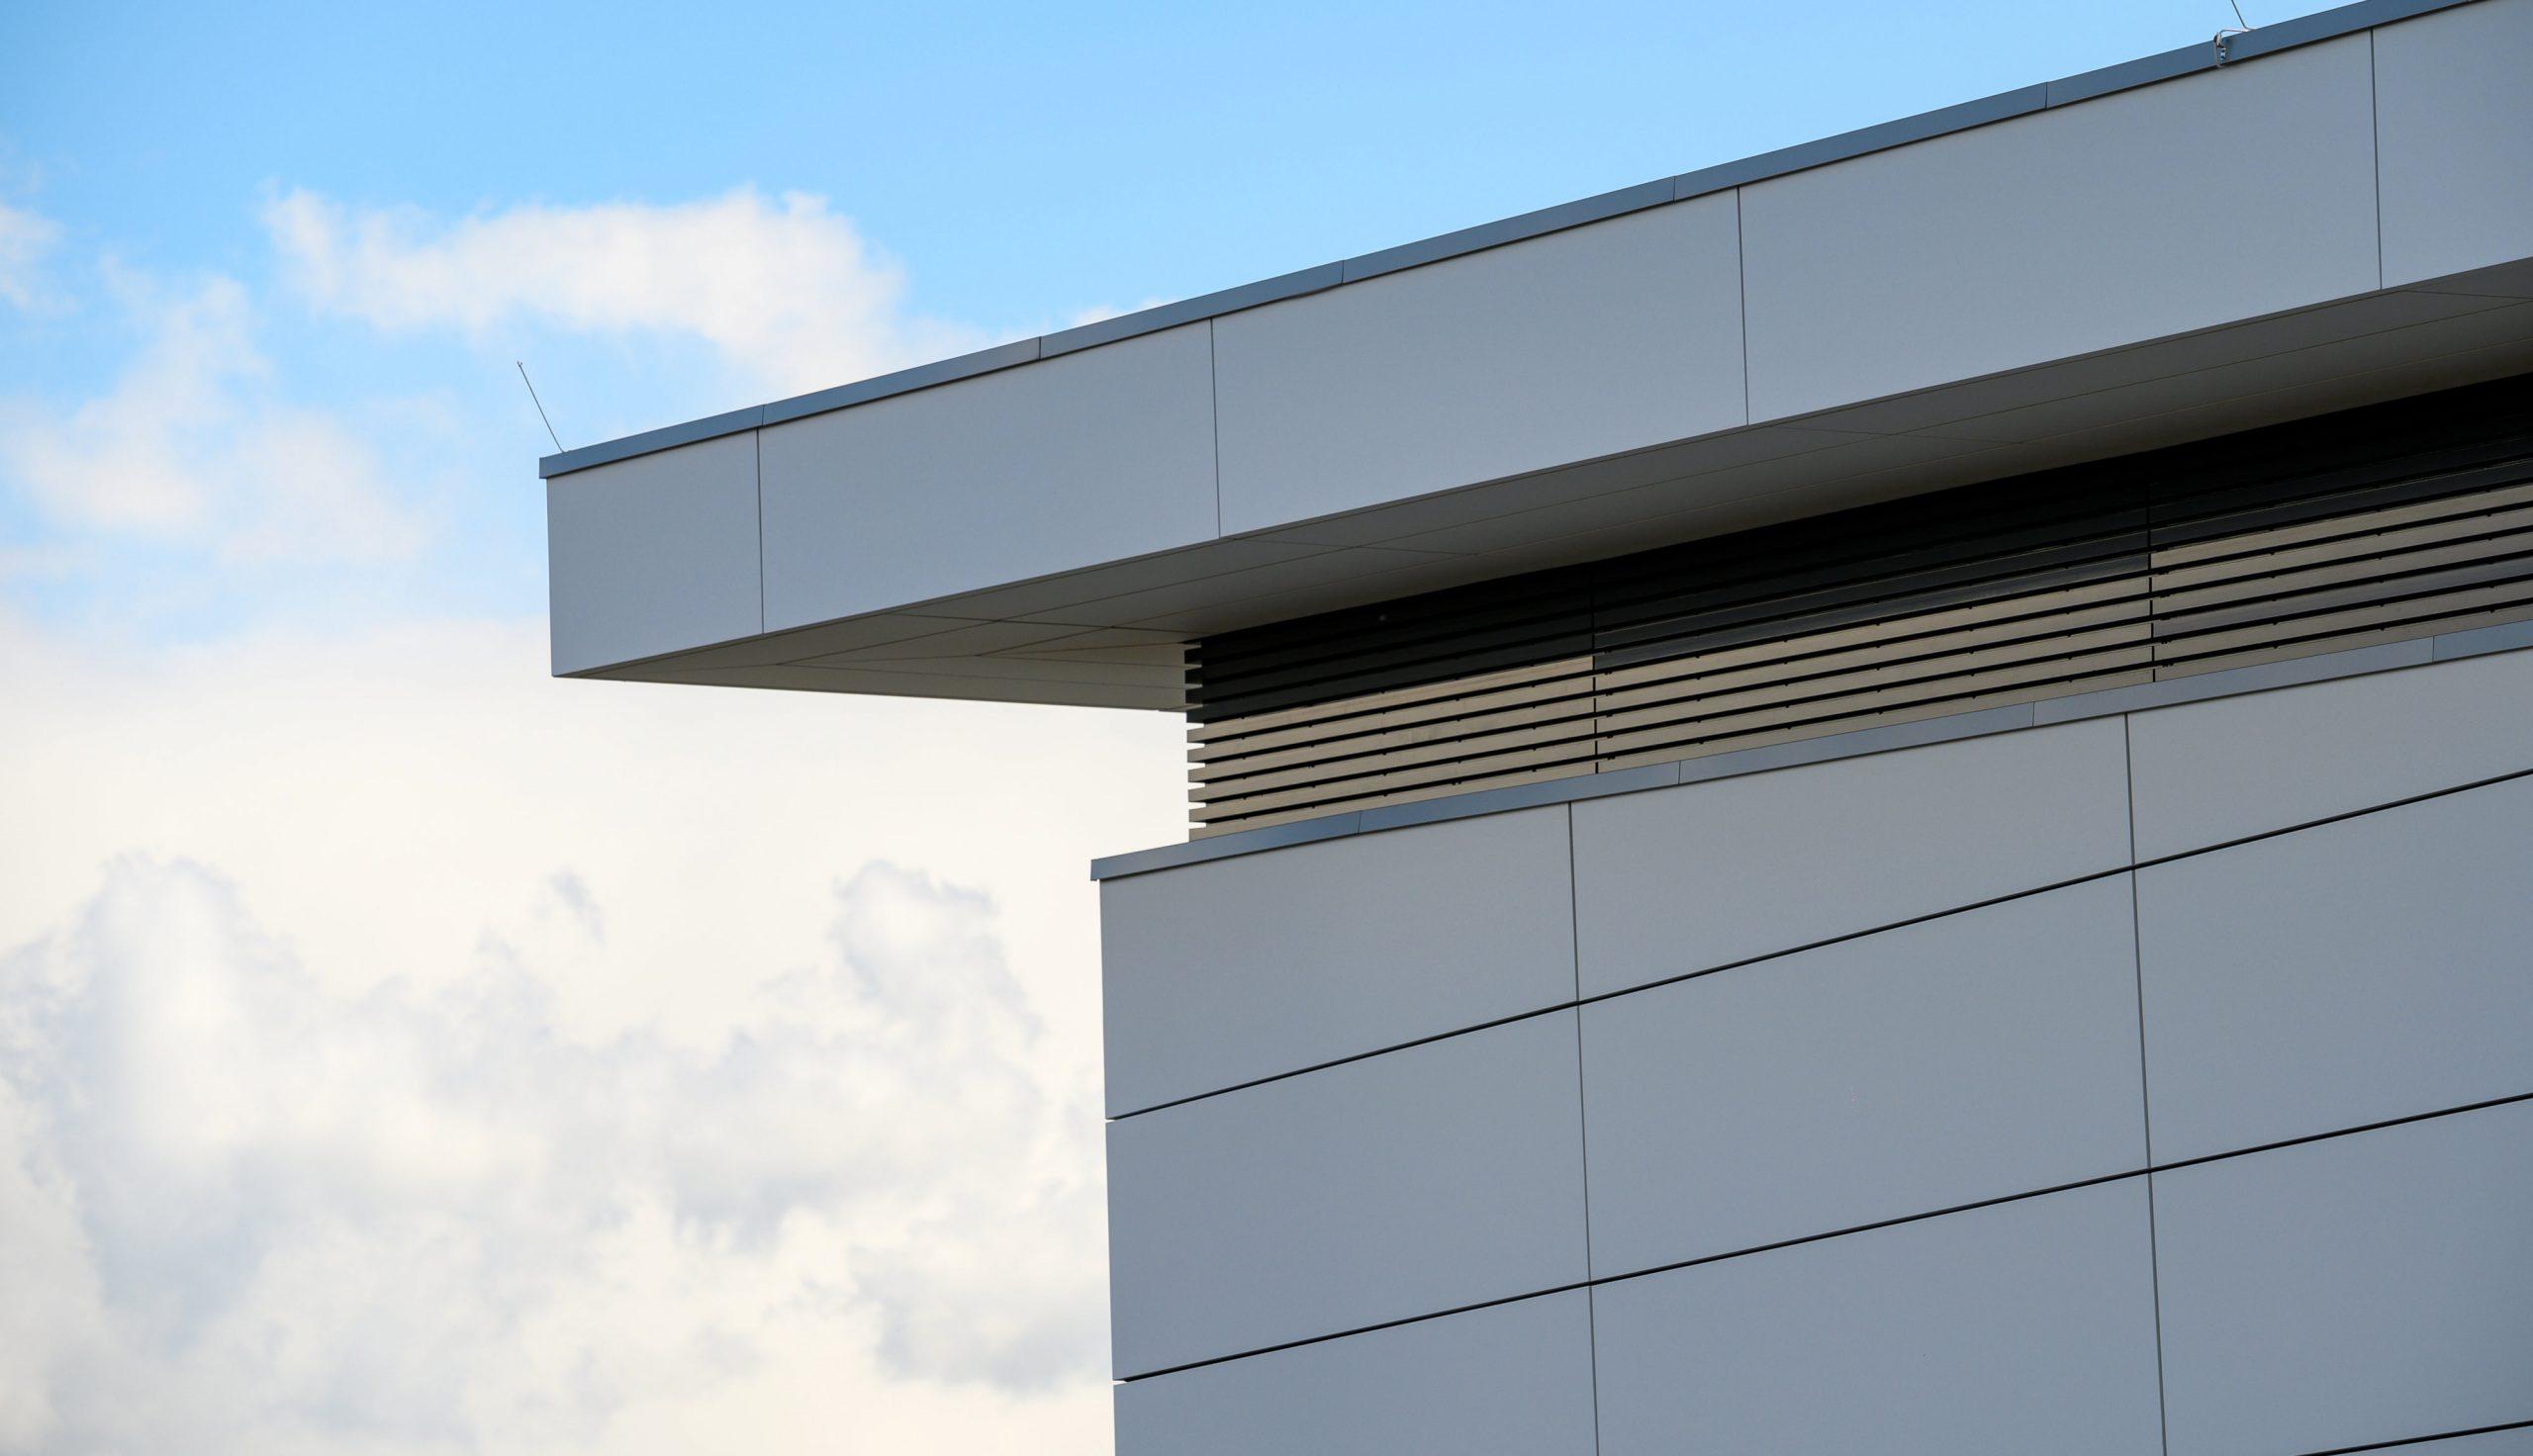 Projektbild 8, Kfz Instandsetzungshalle |  |  H.-J. Zieten Kaserne Beelitz